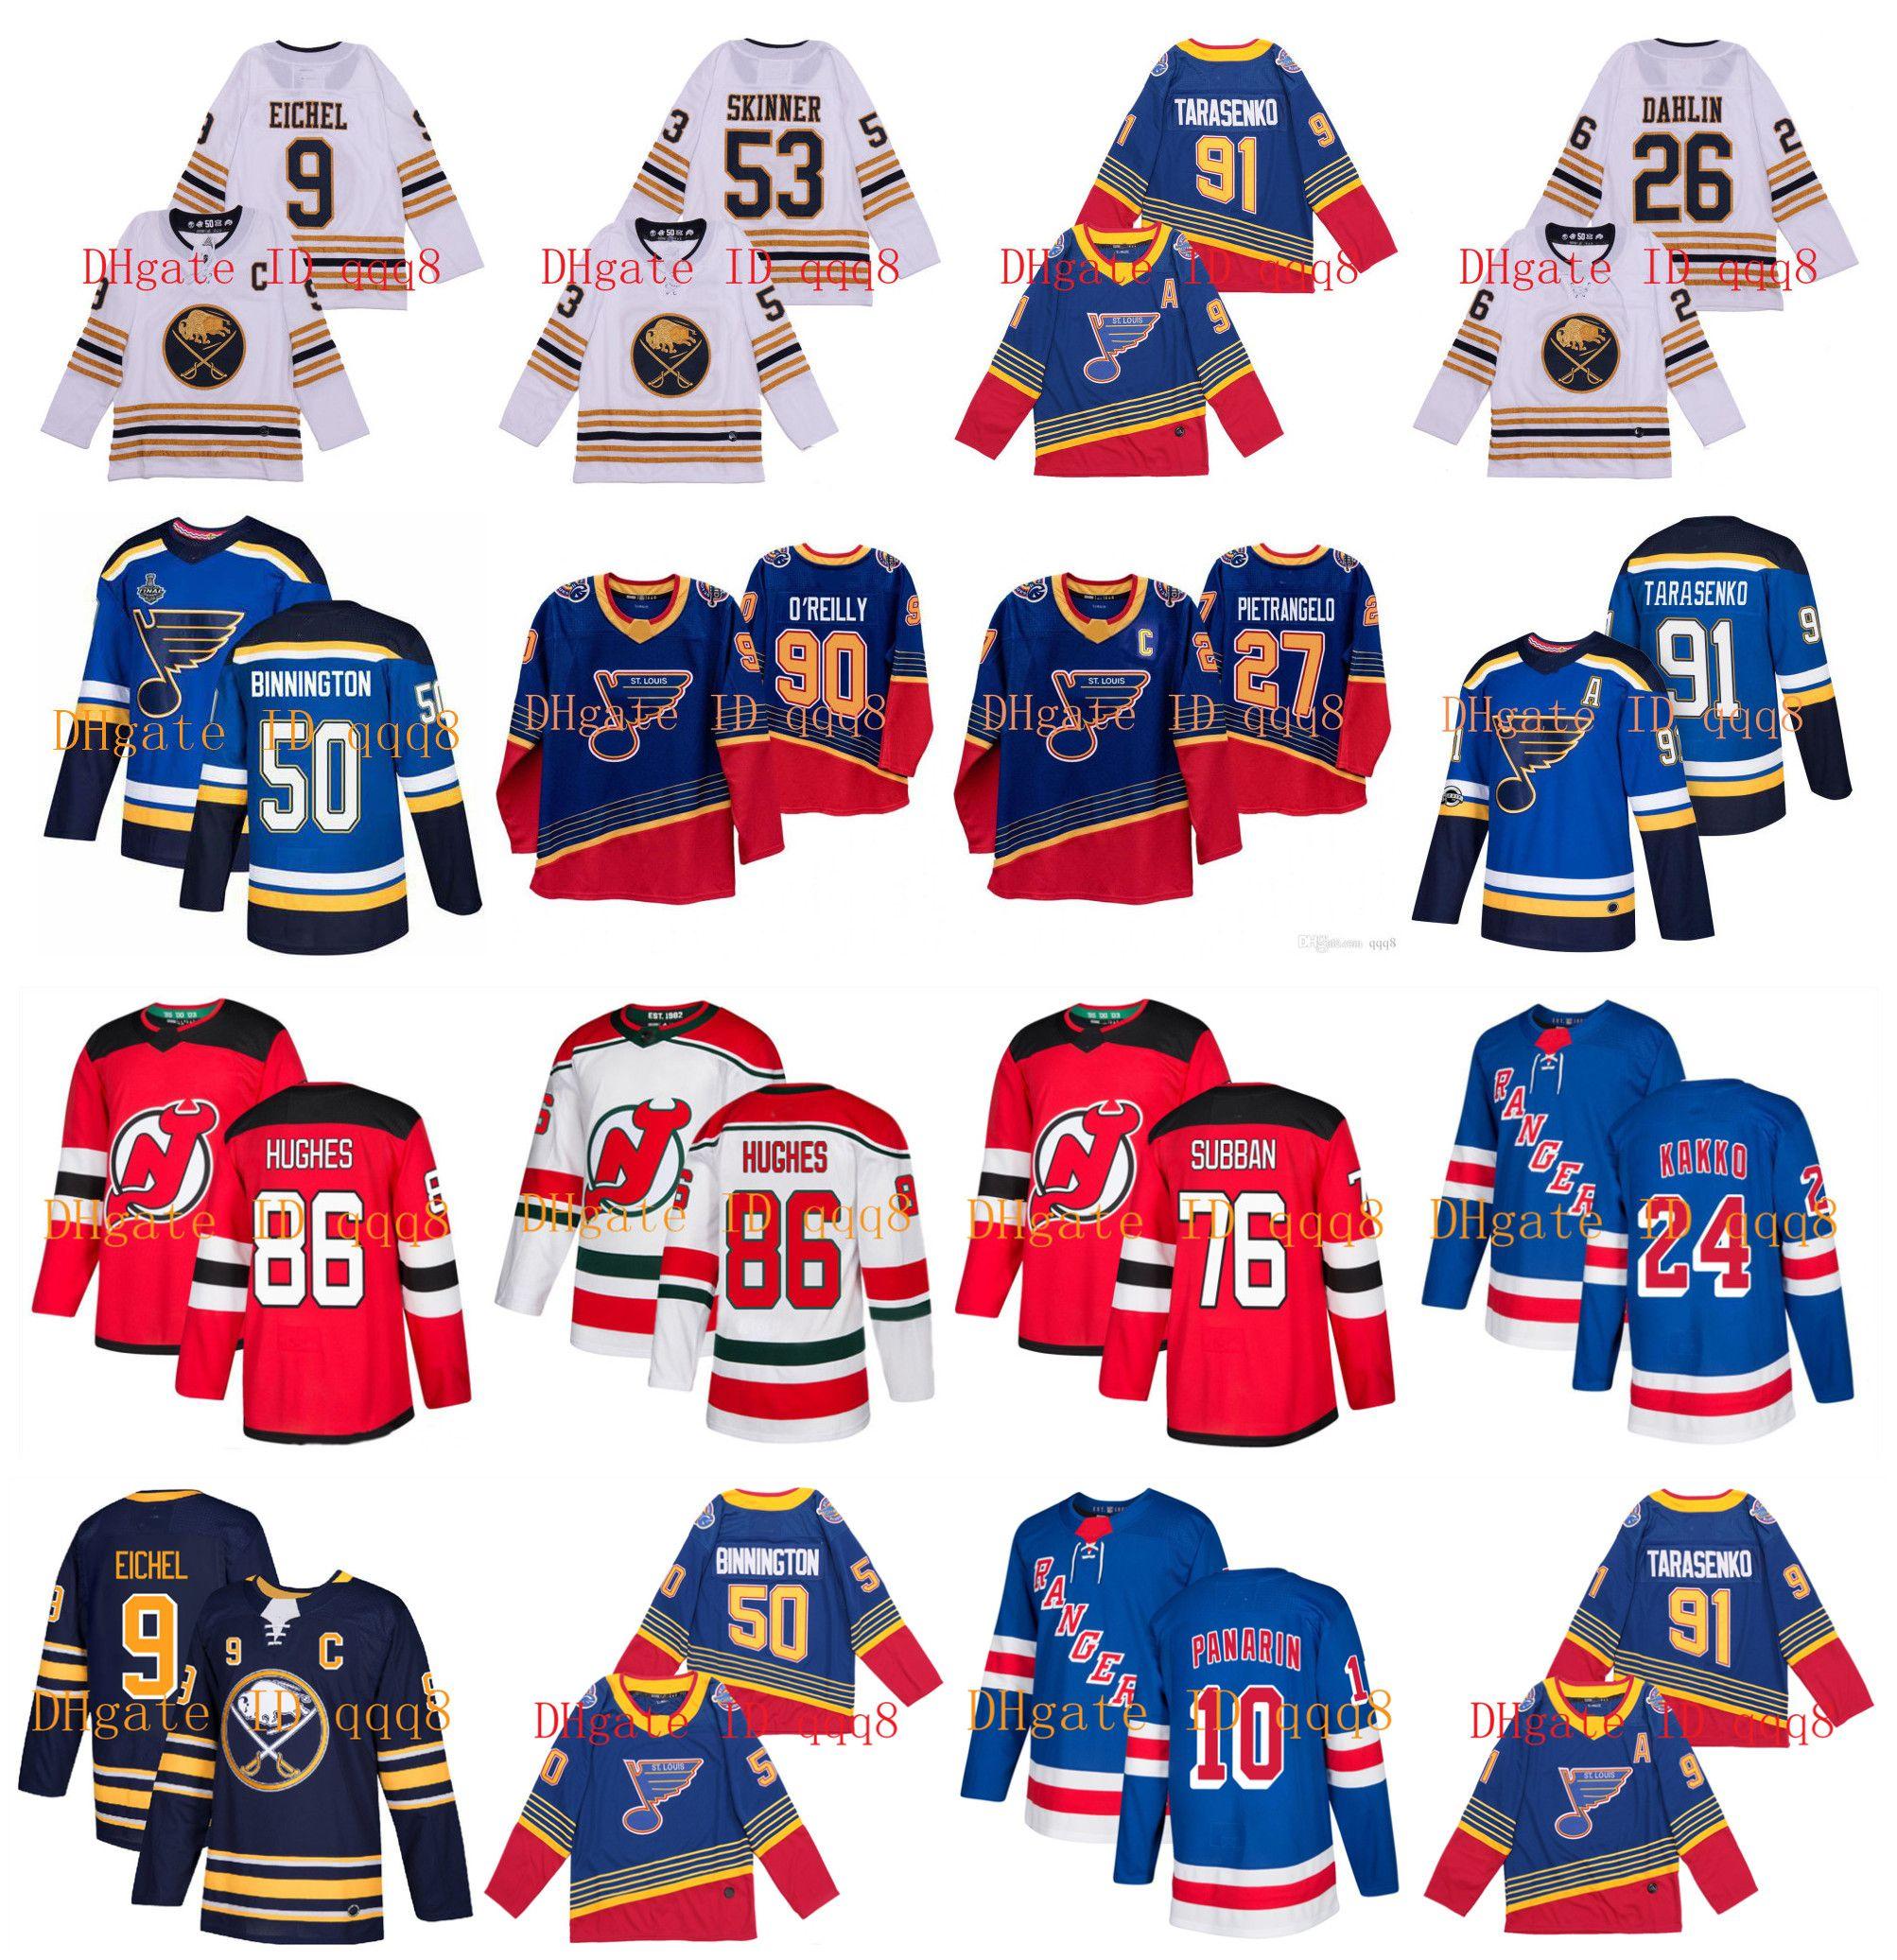 Buffalo Sabres Jersey Jack Eichel Binnington Ryan O'Reilly St Louis Blues Rangers Kaapo Kakko Jack Hughes New Jersey Devils PK Subban hockey